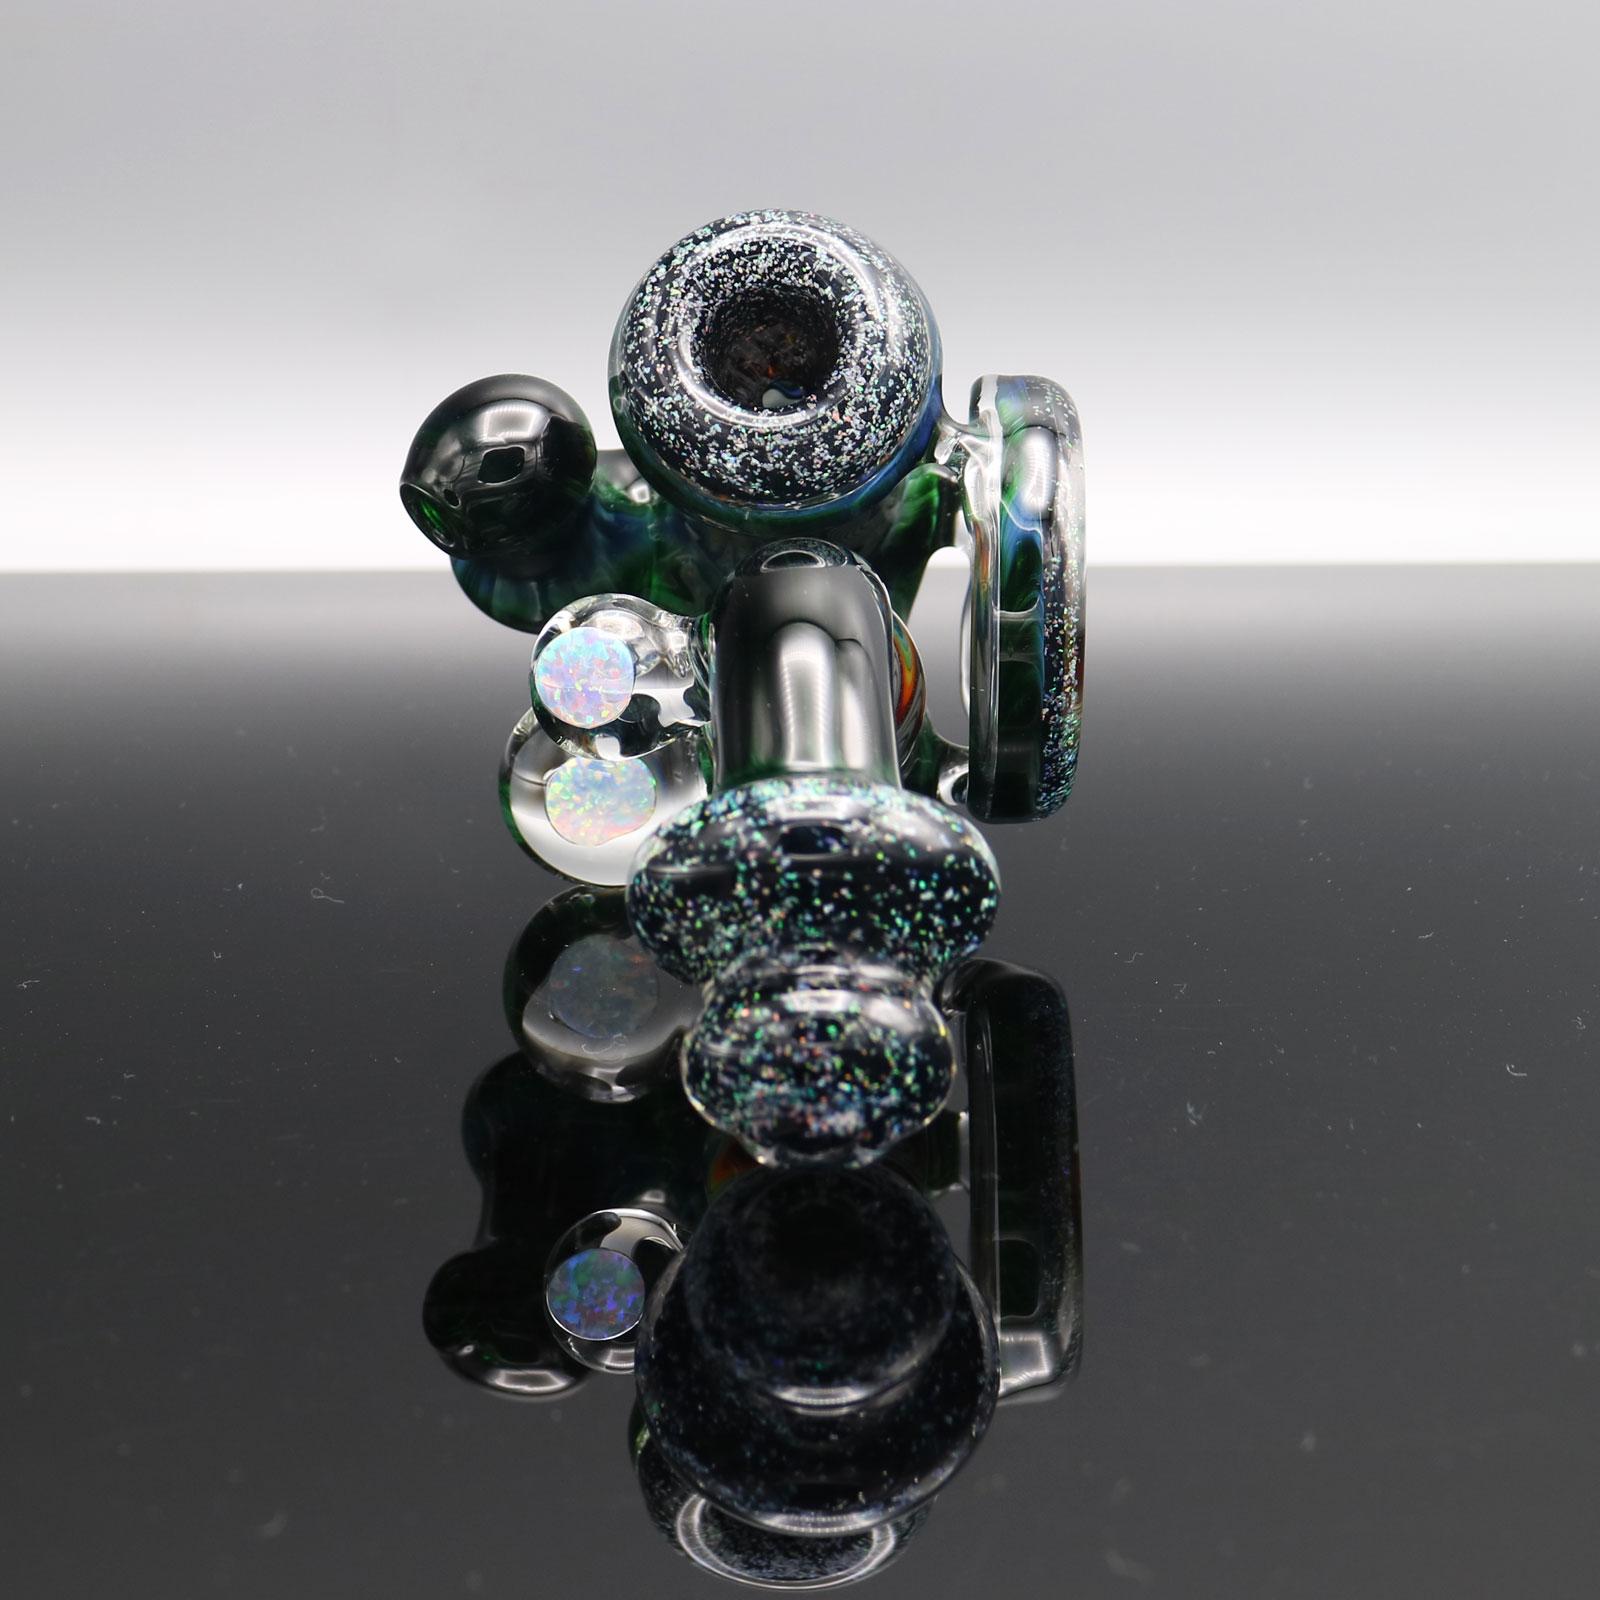 Chappell Glass – Crushed Opal Sherlock